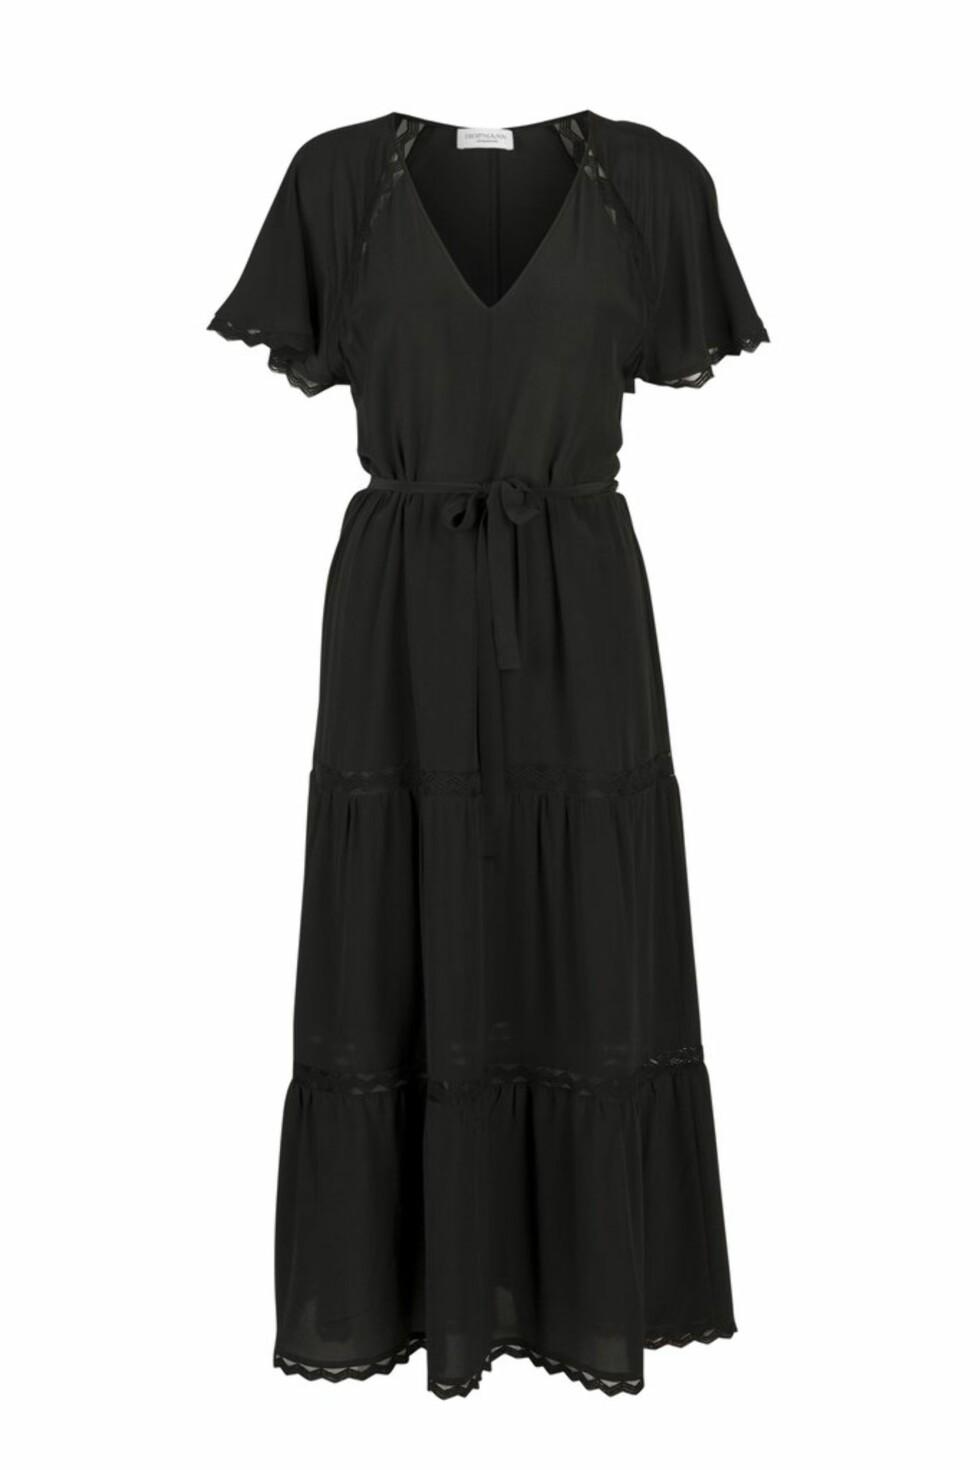 <strong>Kjole fra Hofmann Copenhagen | kr 2699 | https:</strong>//hofmanncopenhagen.com/collections/new-arrivals-1/products/athene-silk-dress-wine